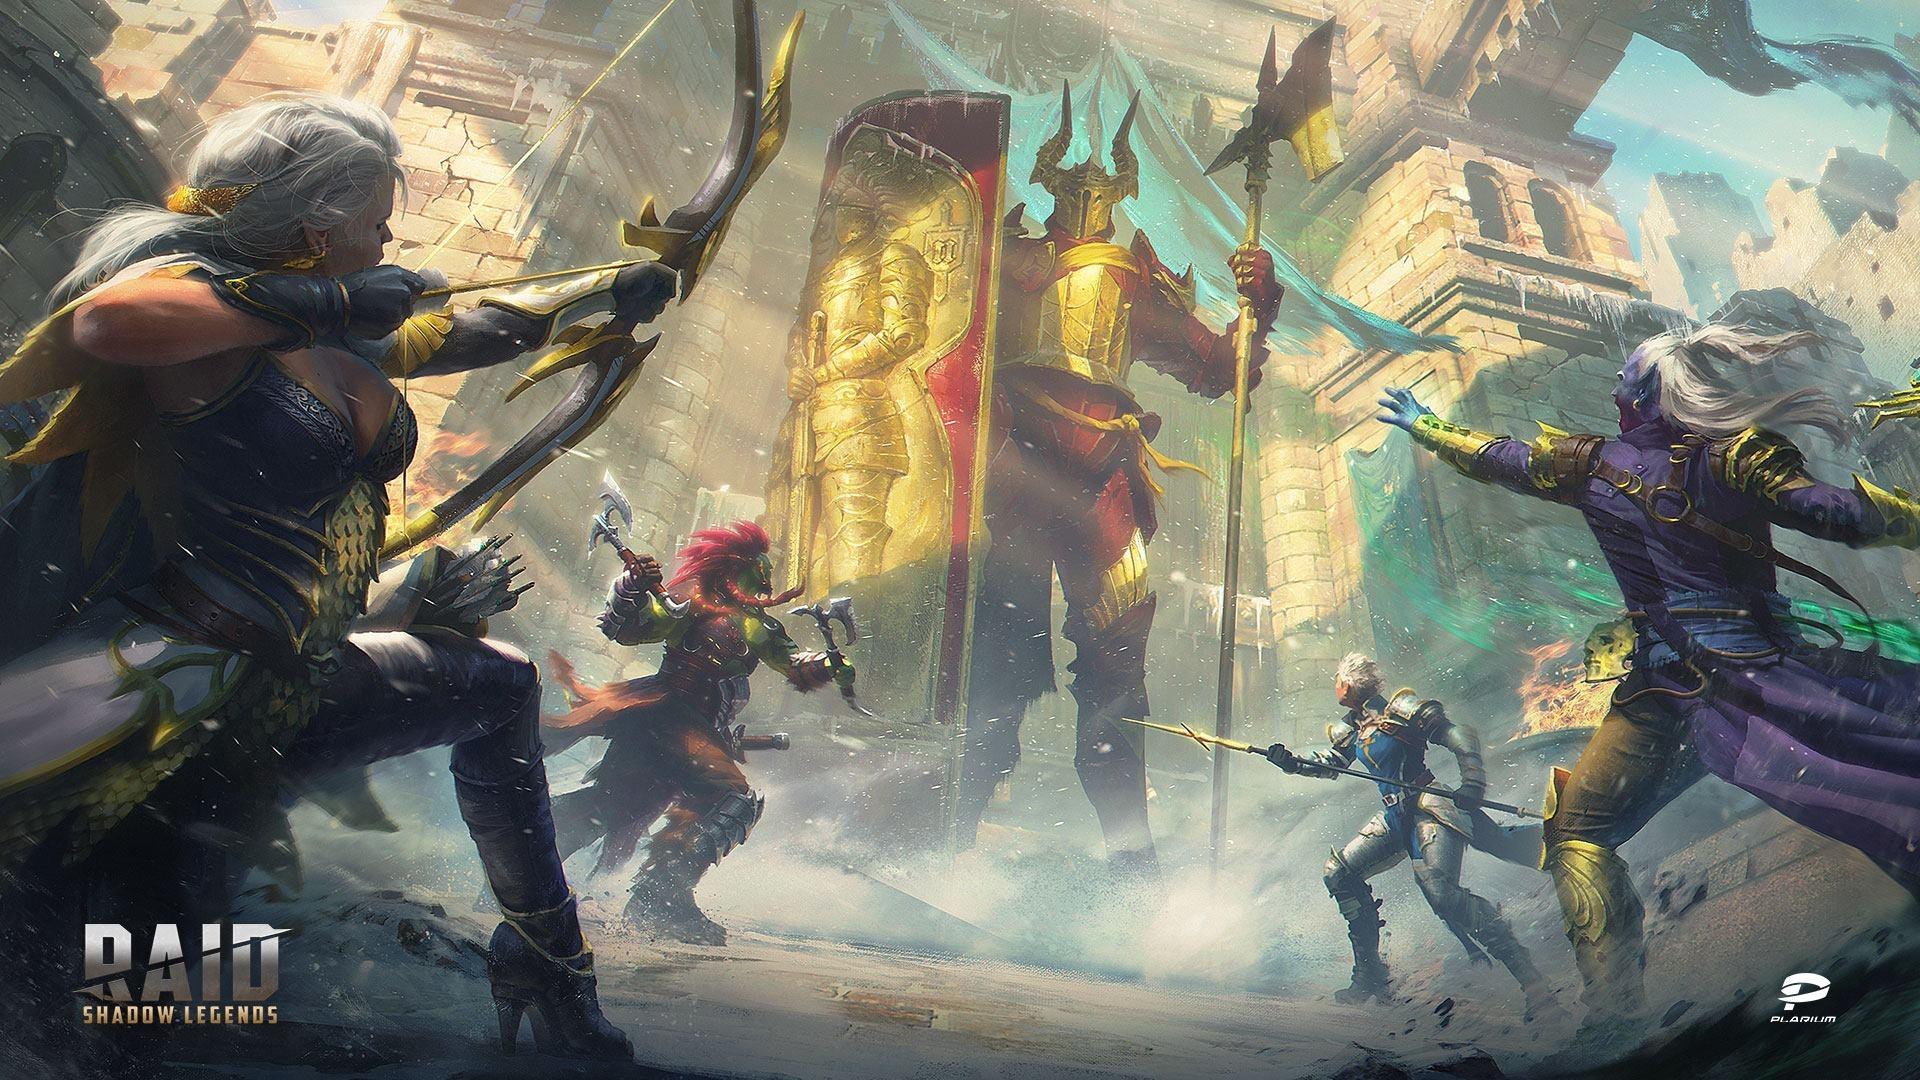 Raid Shadow Legends cool background